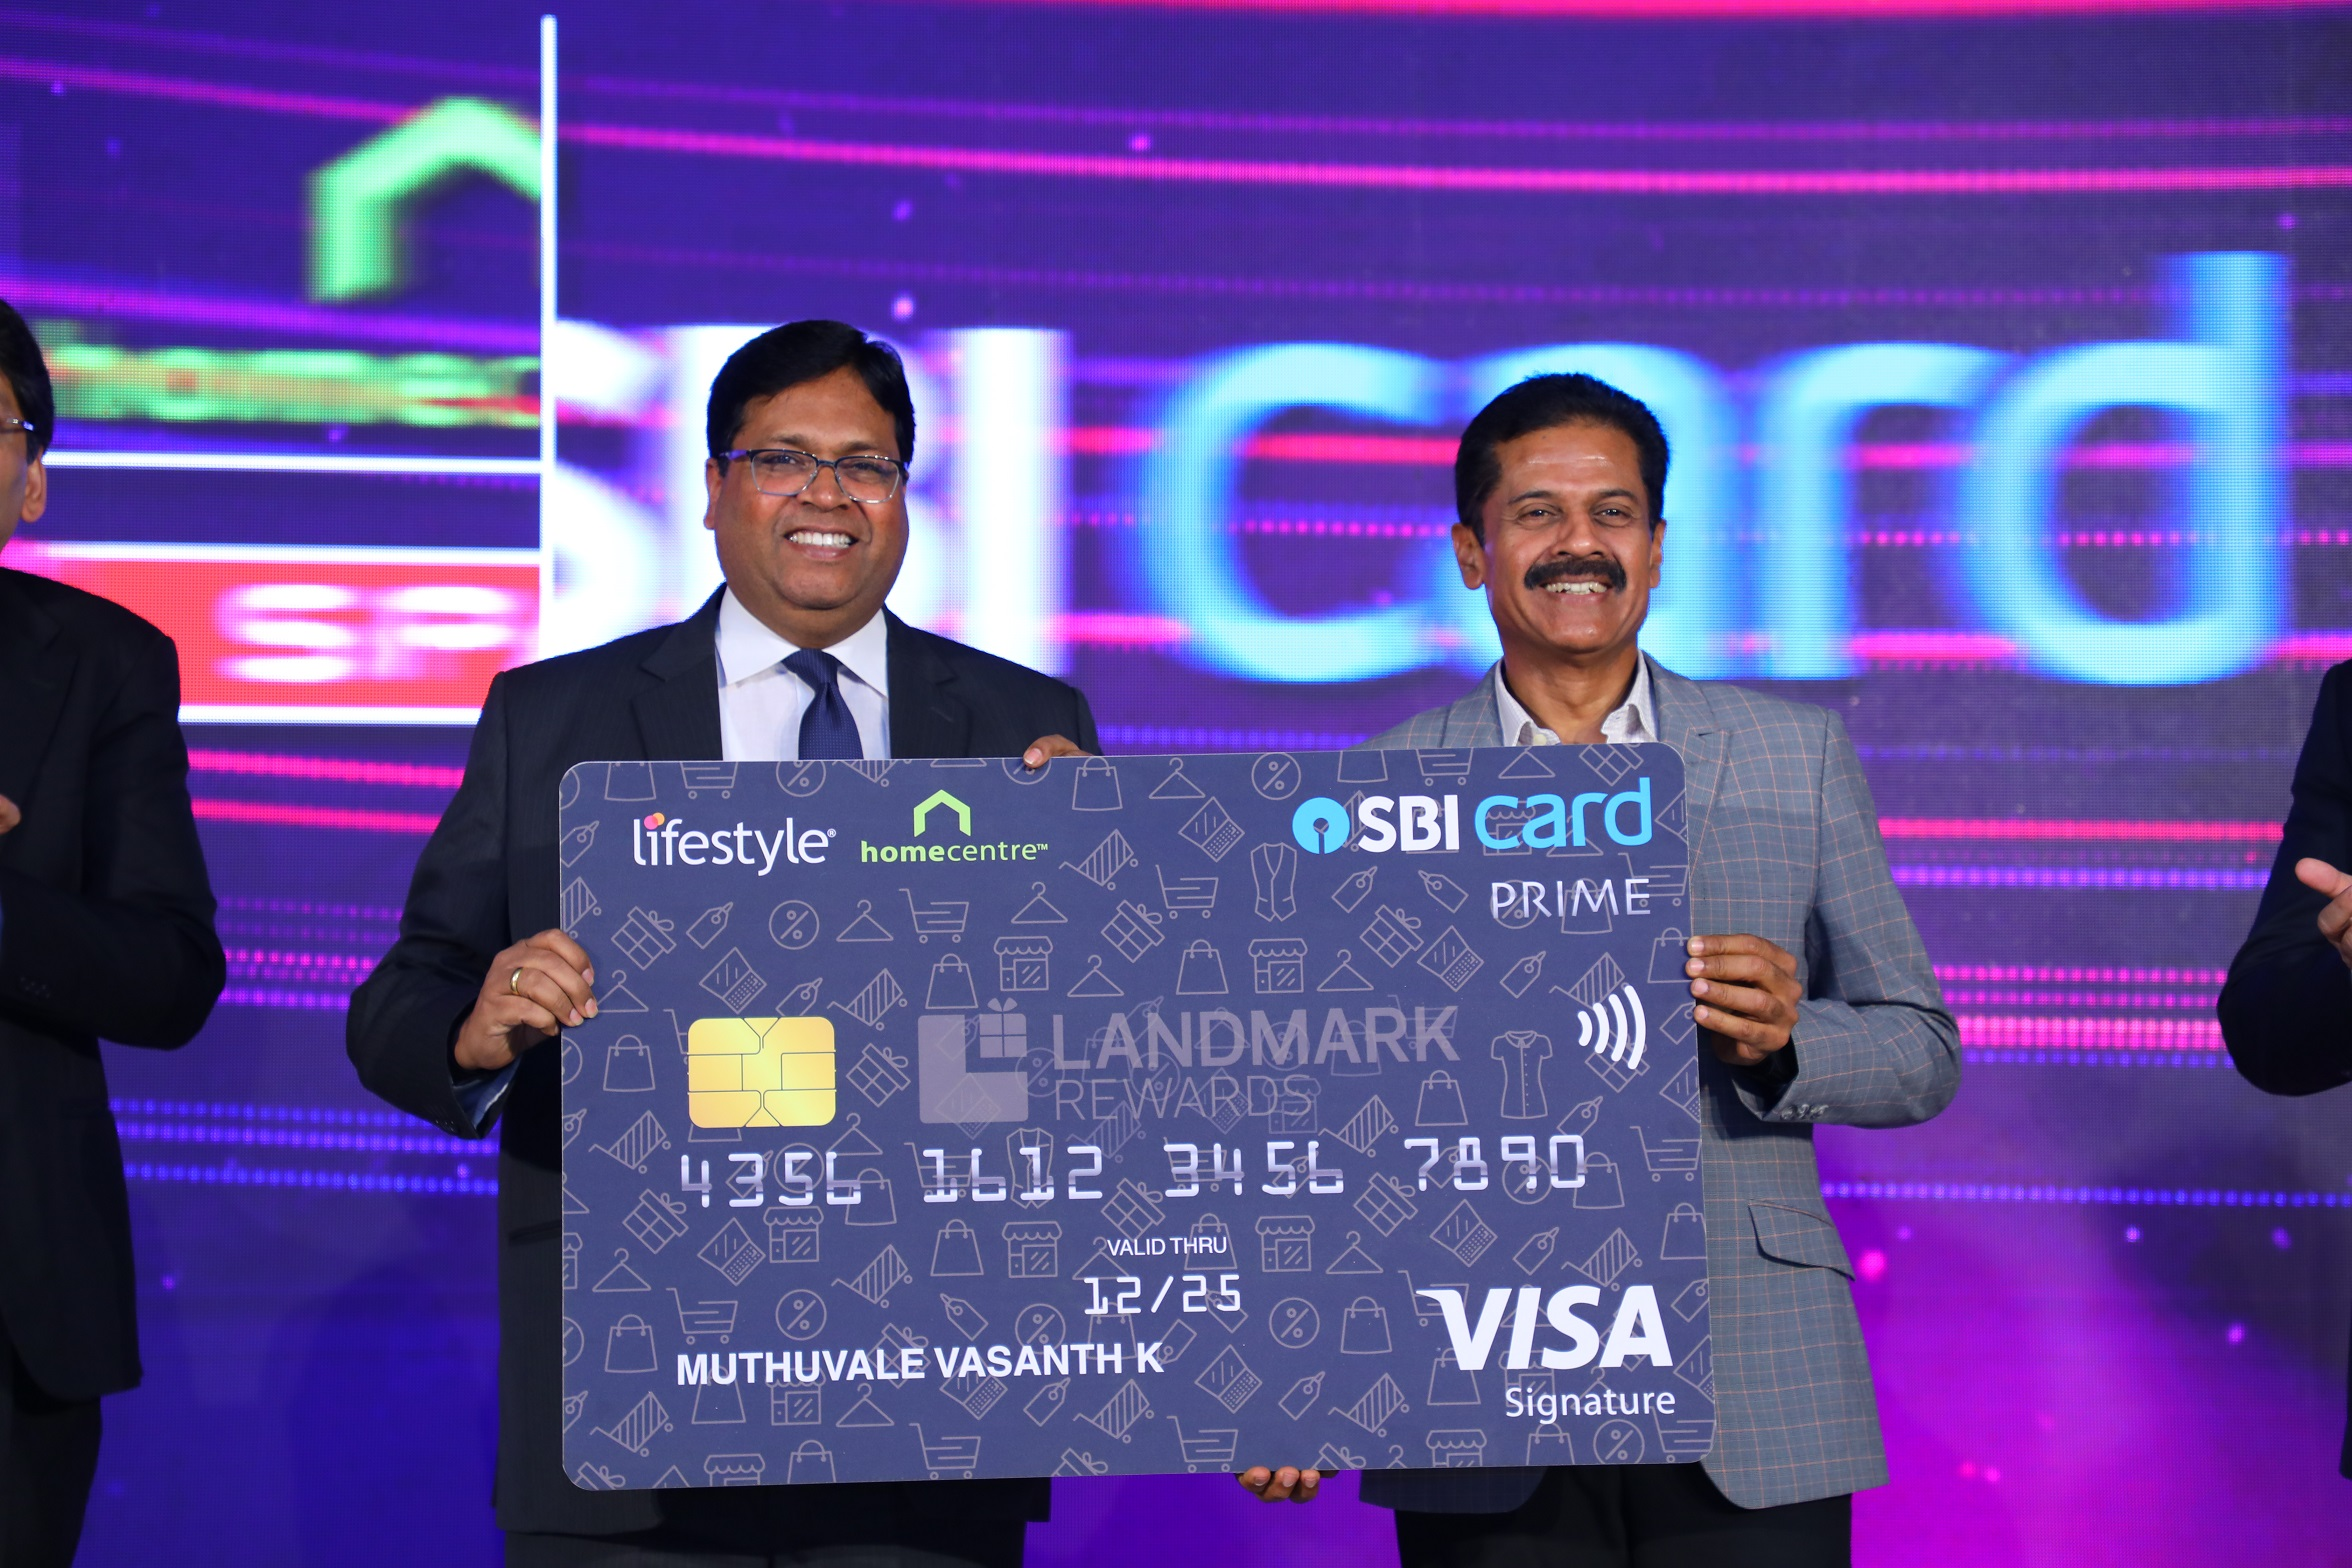 Photo 001- Mr Hardayal Prasad, MD & CEO, SBI Card & Mr. Vasanth Kumar , MD, Lifestyle International Pvt. Ltd